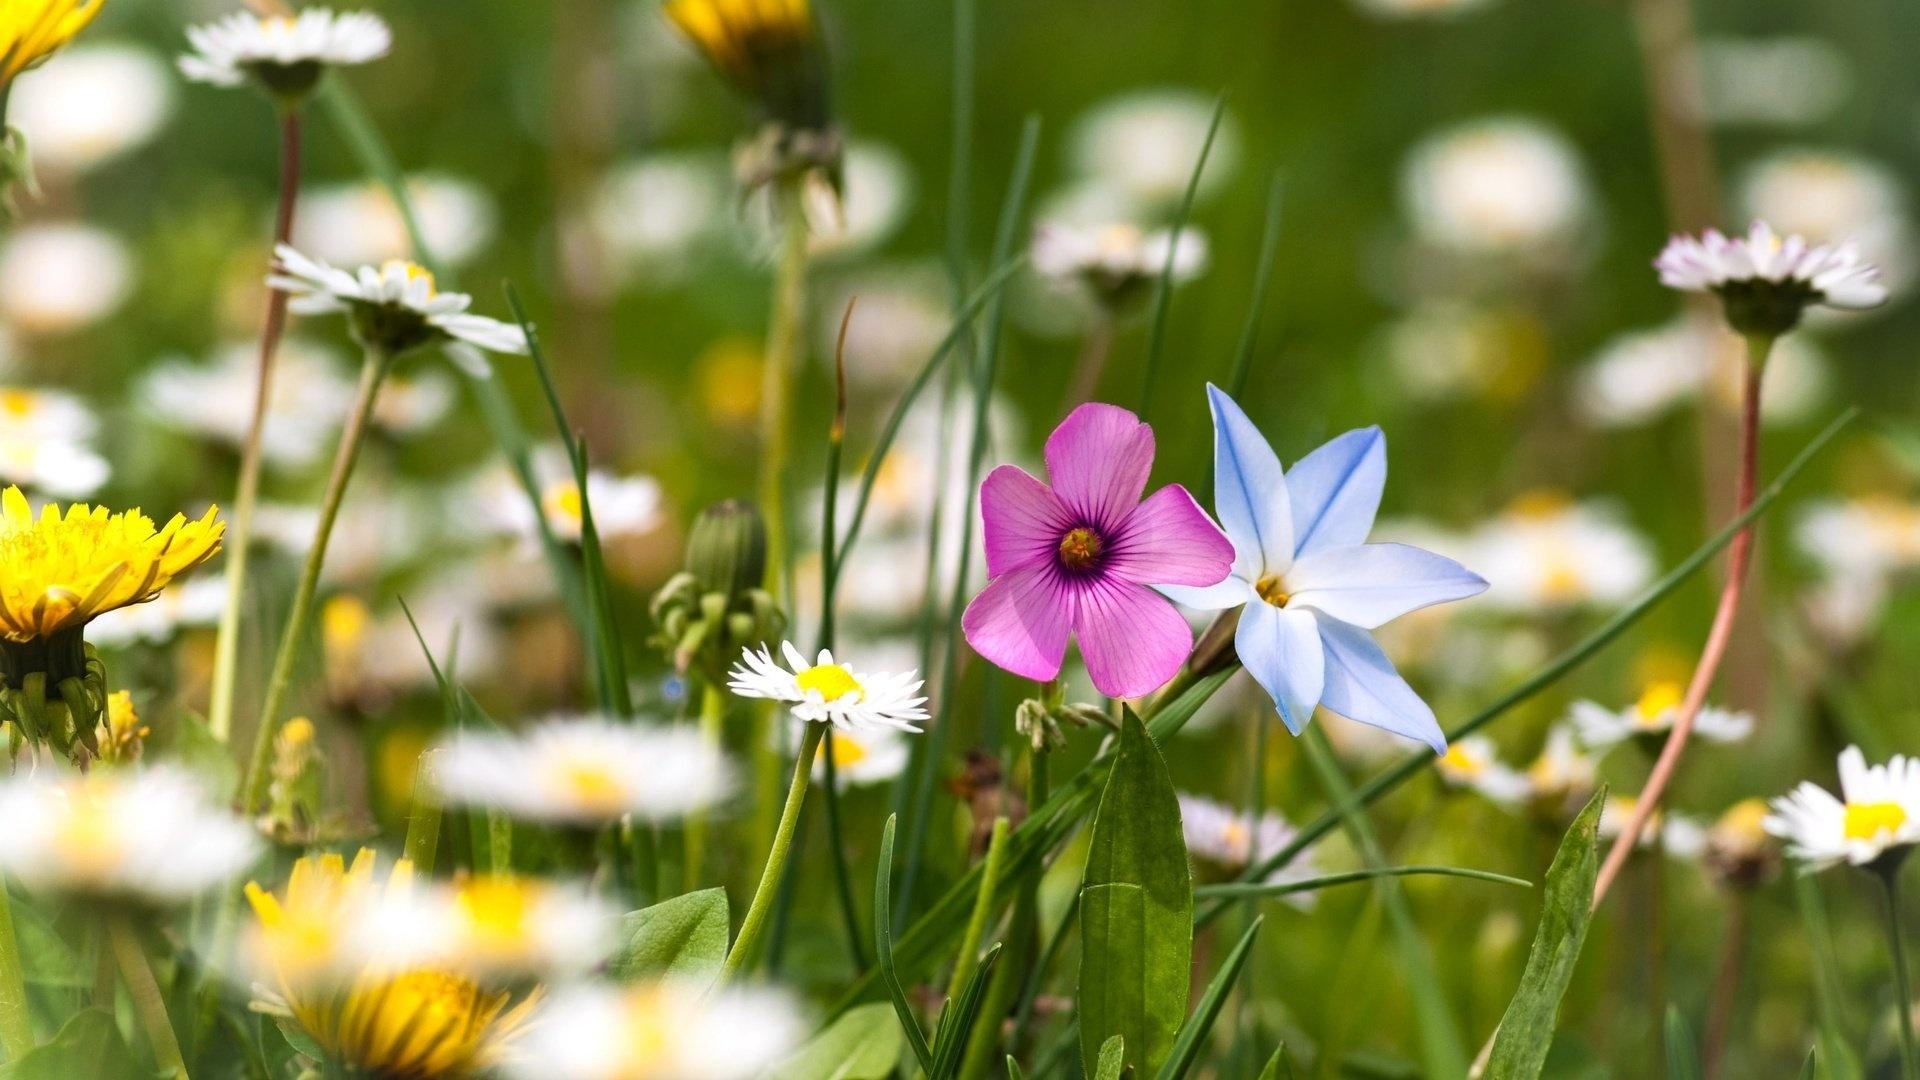 Summer free photo